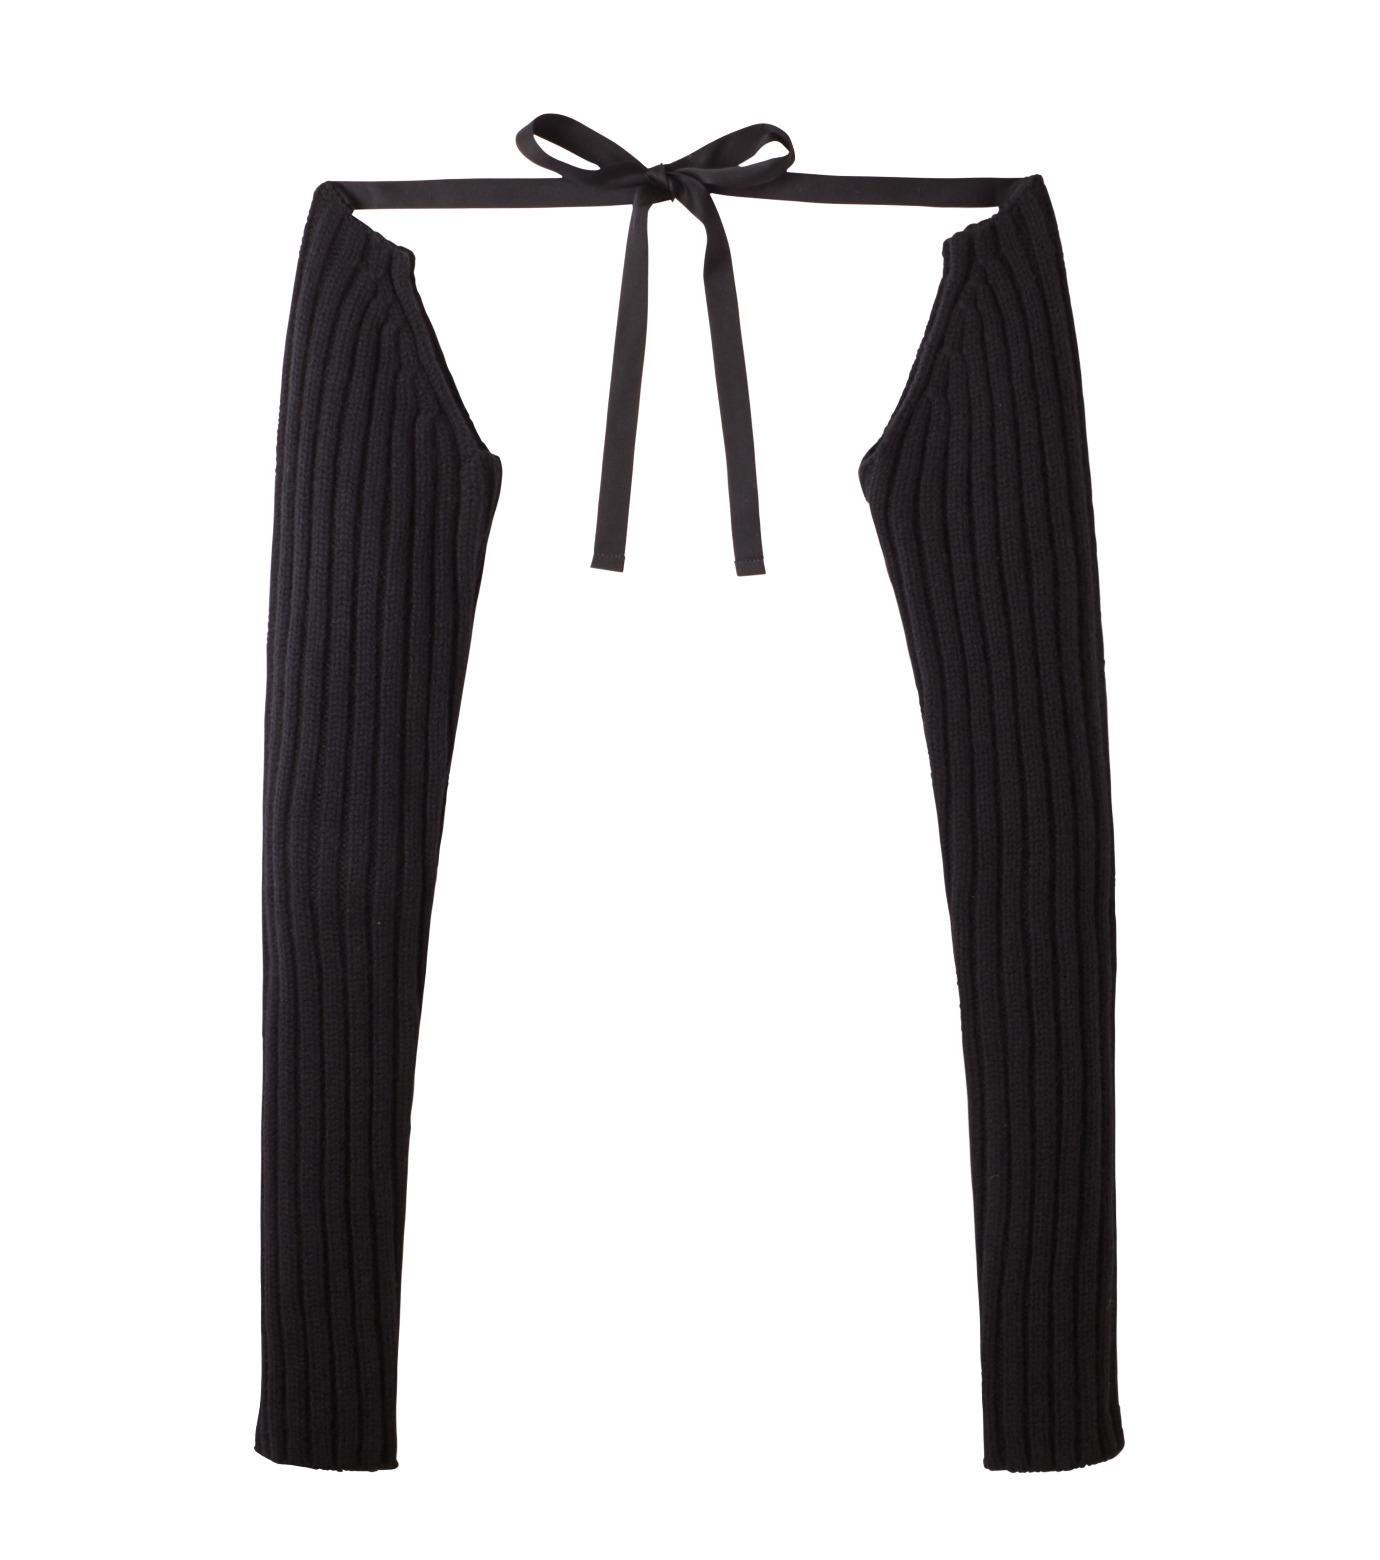 DRESSEDUNDRESSED(ドレスドアンドレスド)のKnit Sleeve-BLACK(アクセサリー/accessory)-DUW16281-13 拡大詳細画像1